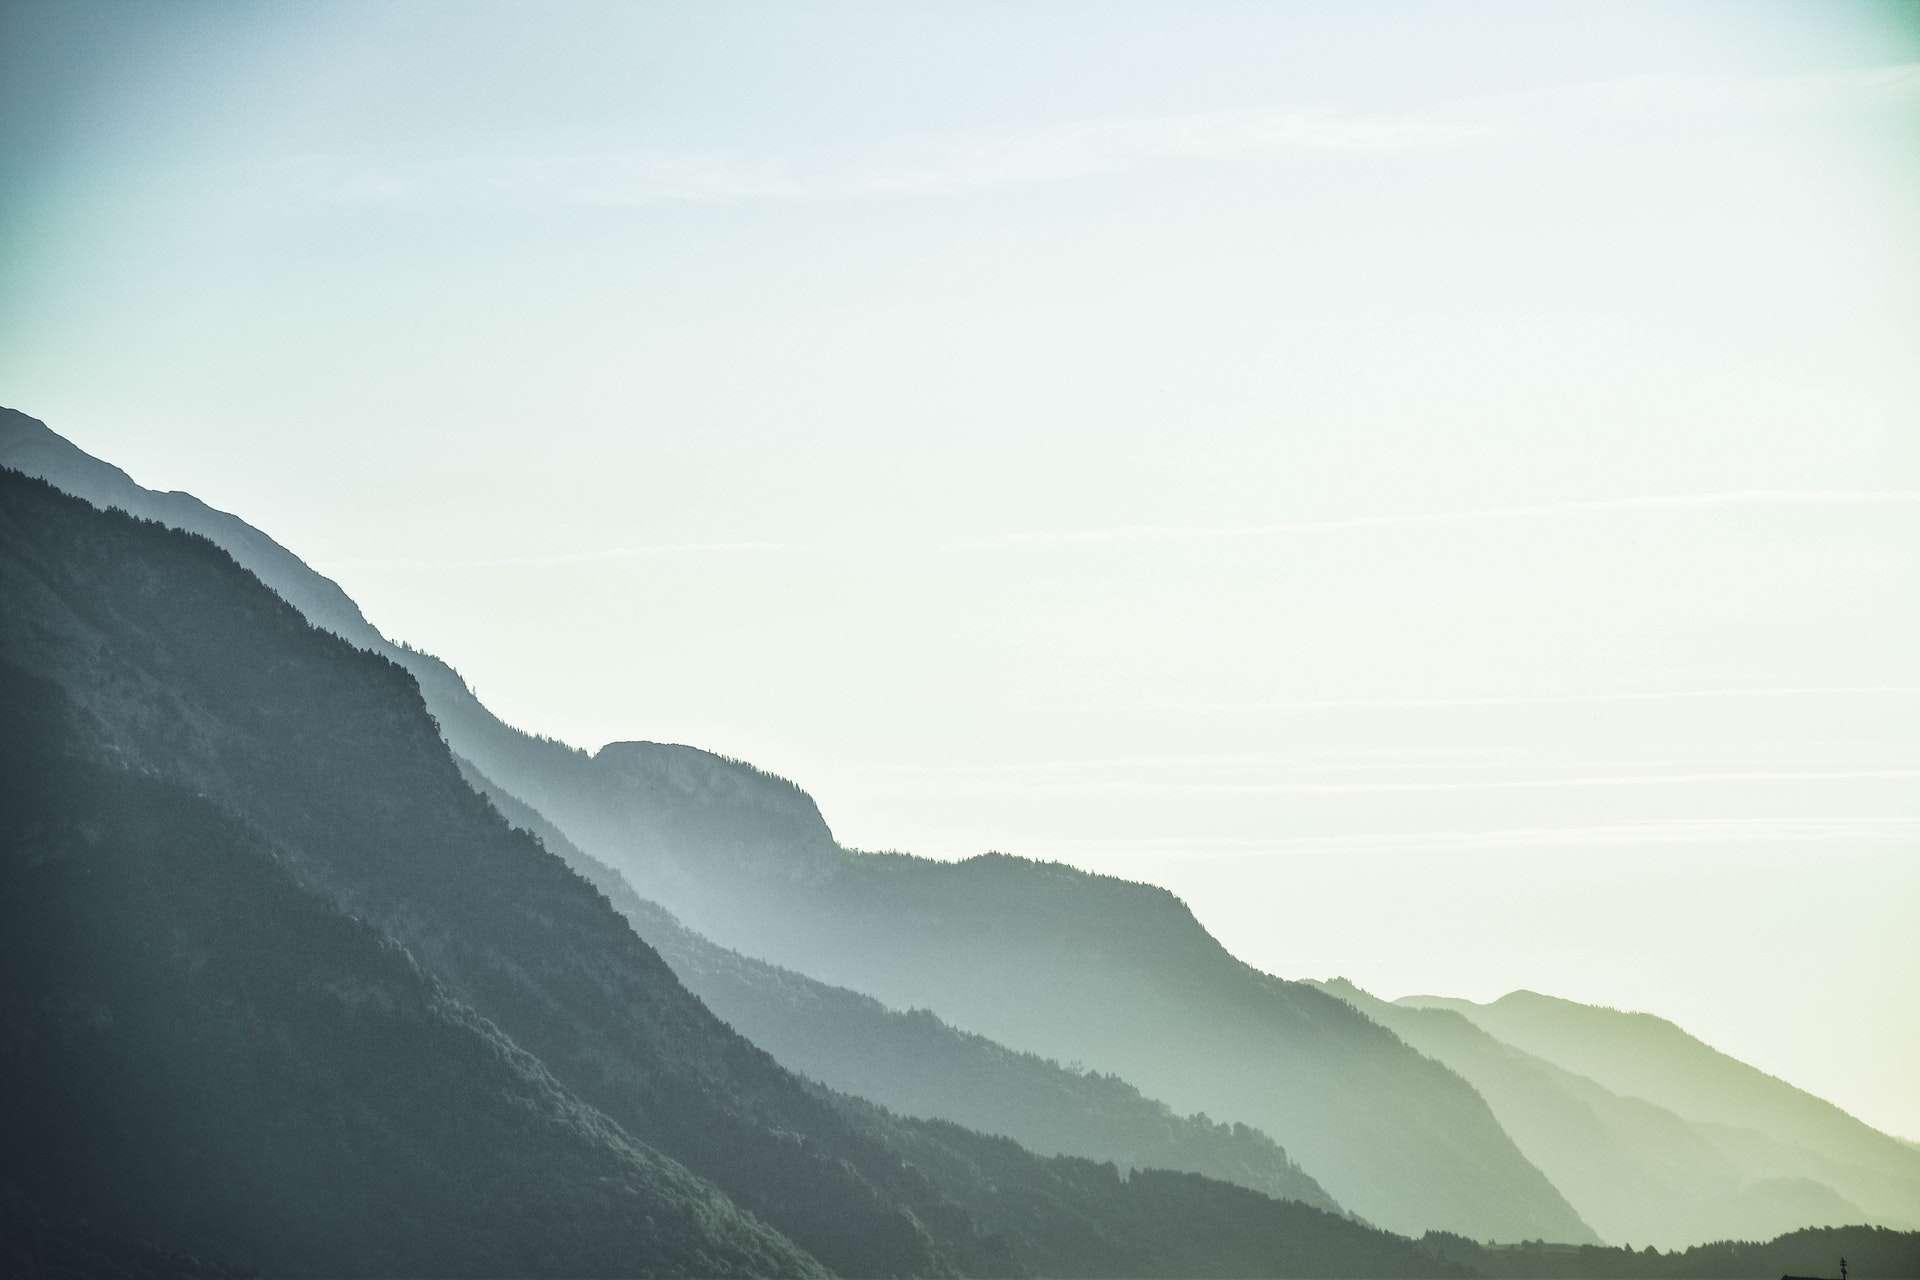 fogs-on-green-mountain-1054222.jpg